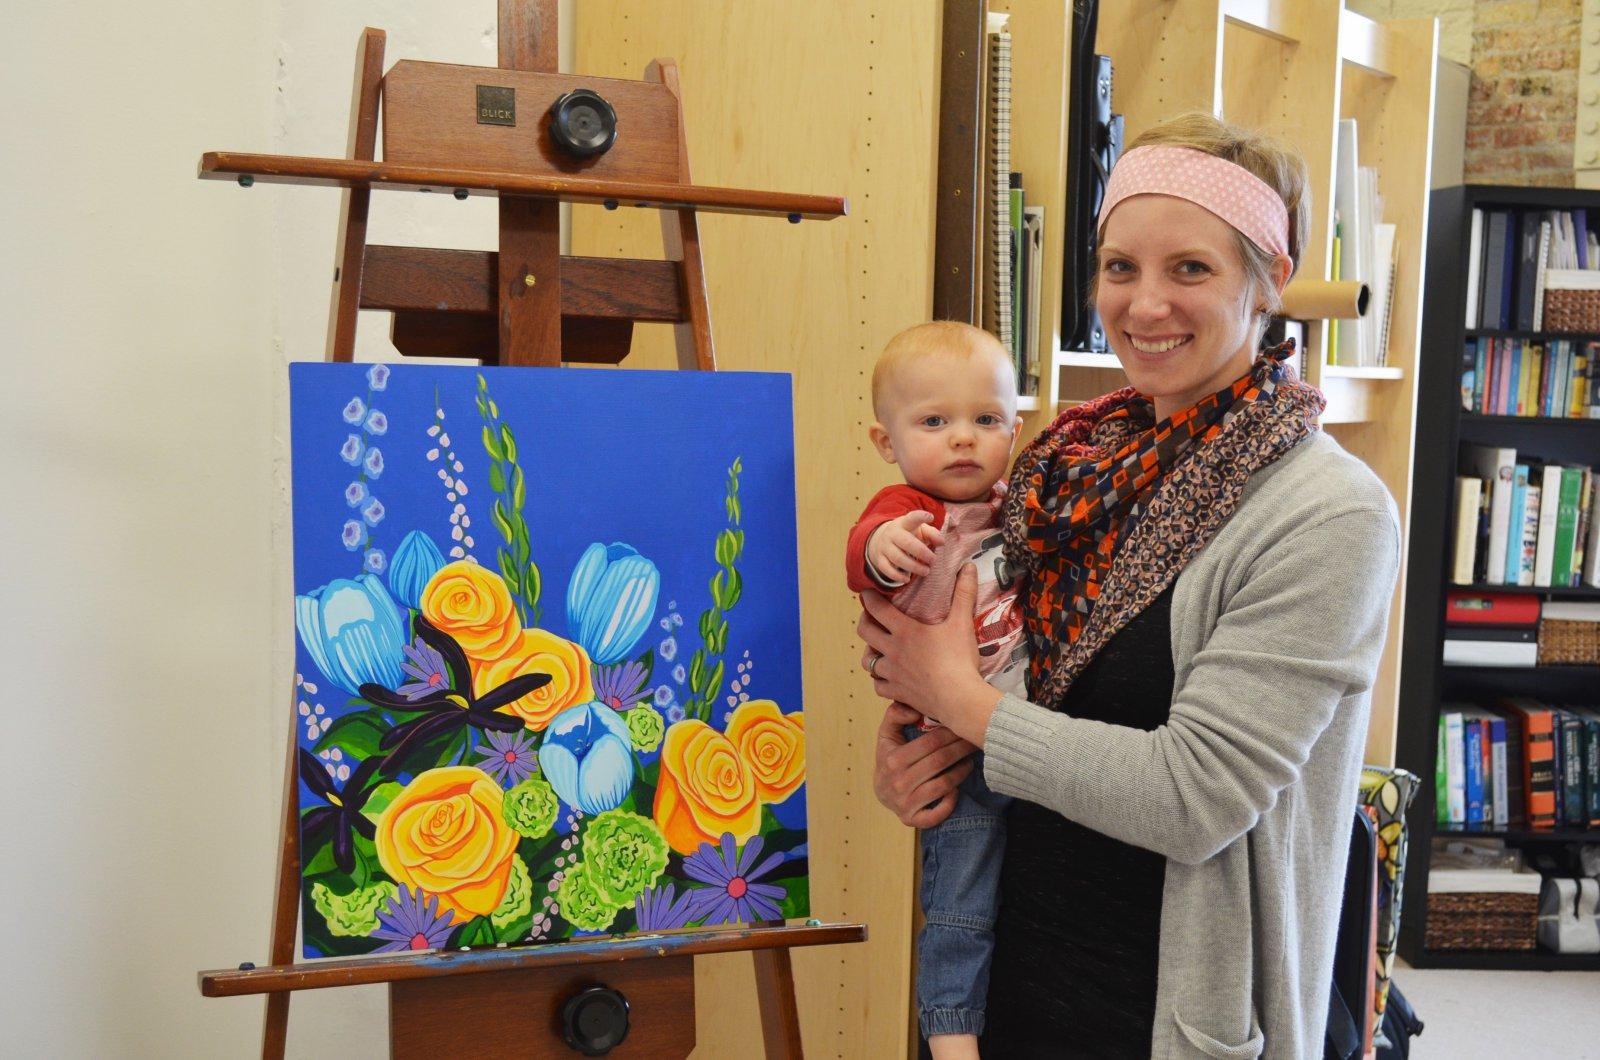 Caitlin Voigt and her son Ezra